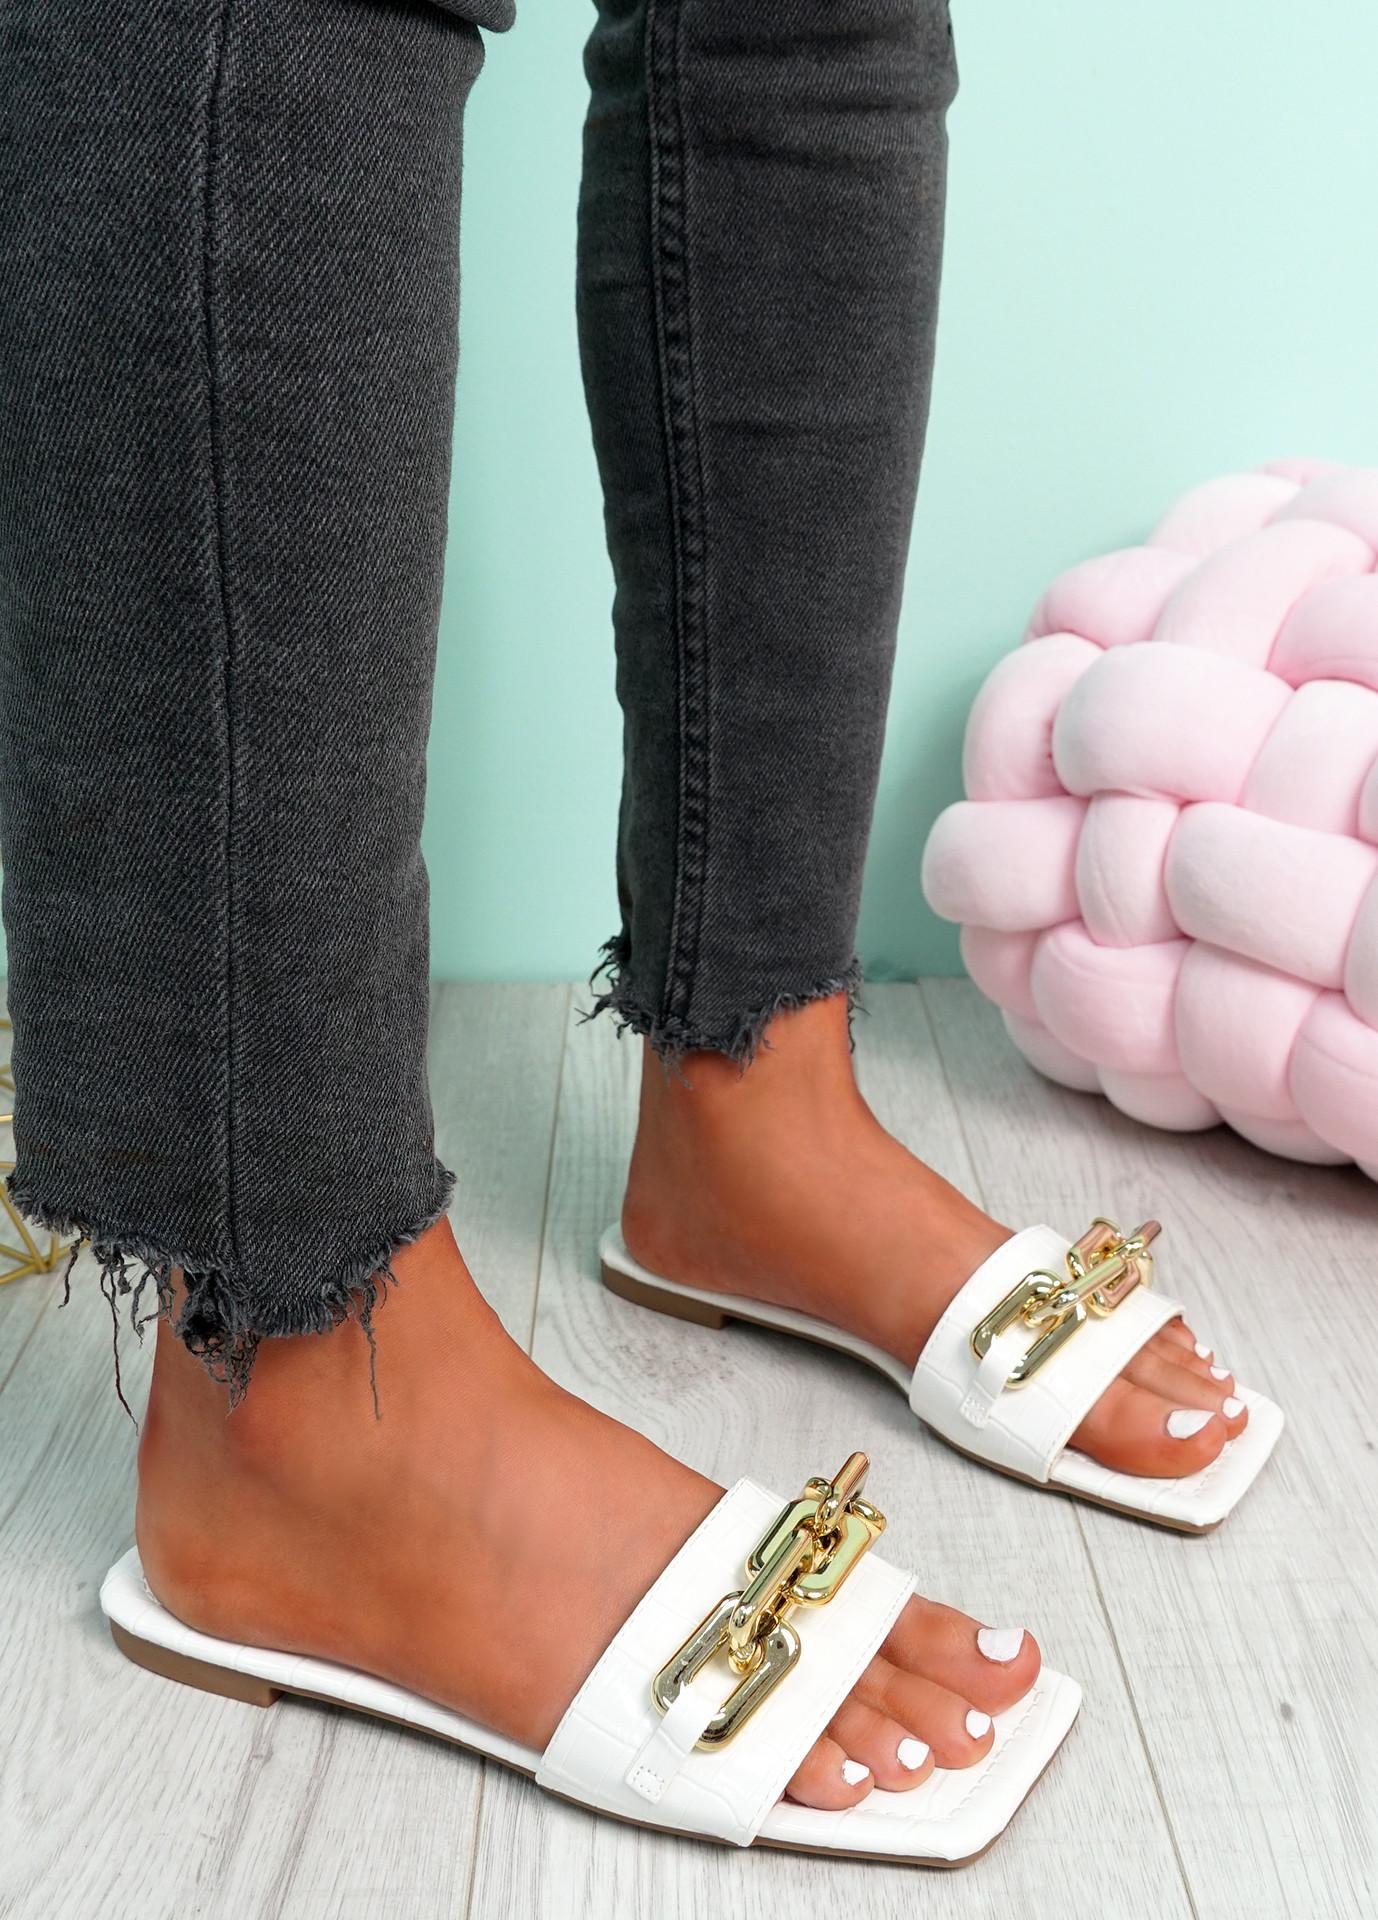 Loxy White Croc Pattern Flat Sandals